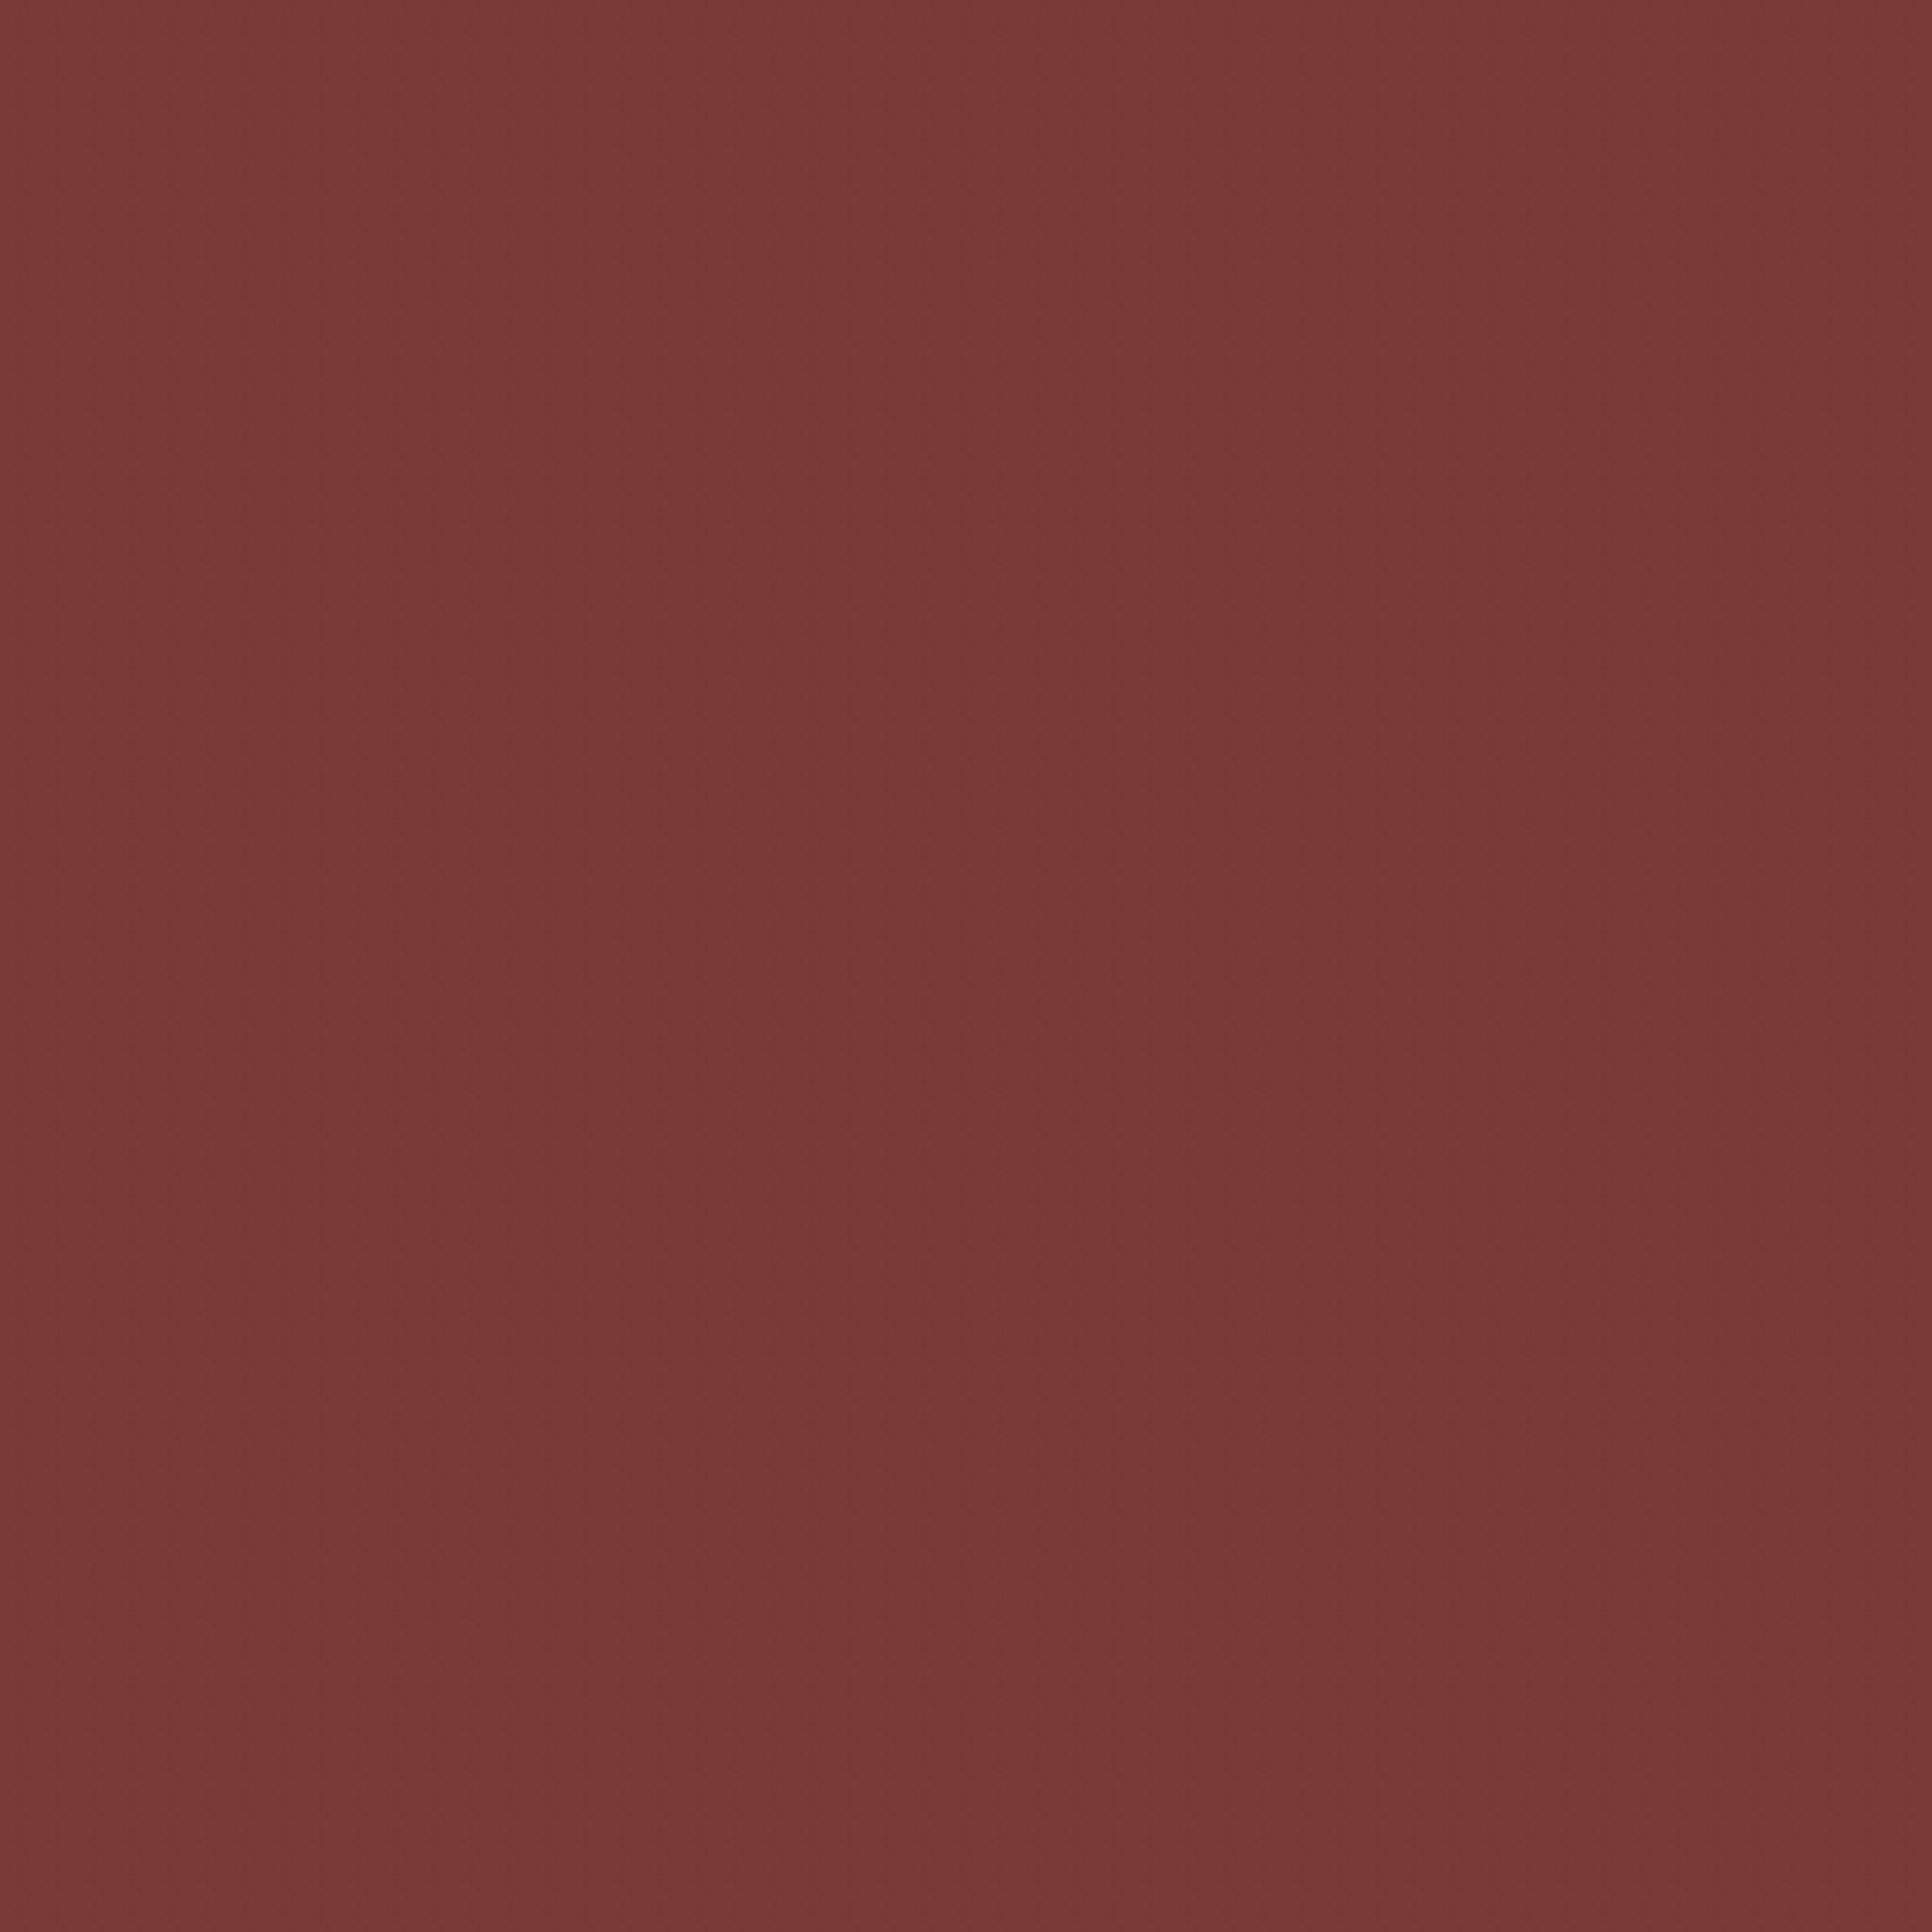 Una Ground Control Ideal red/grey